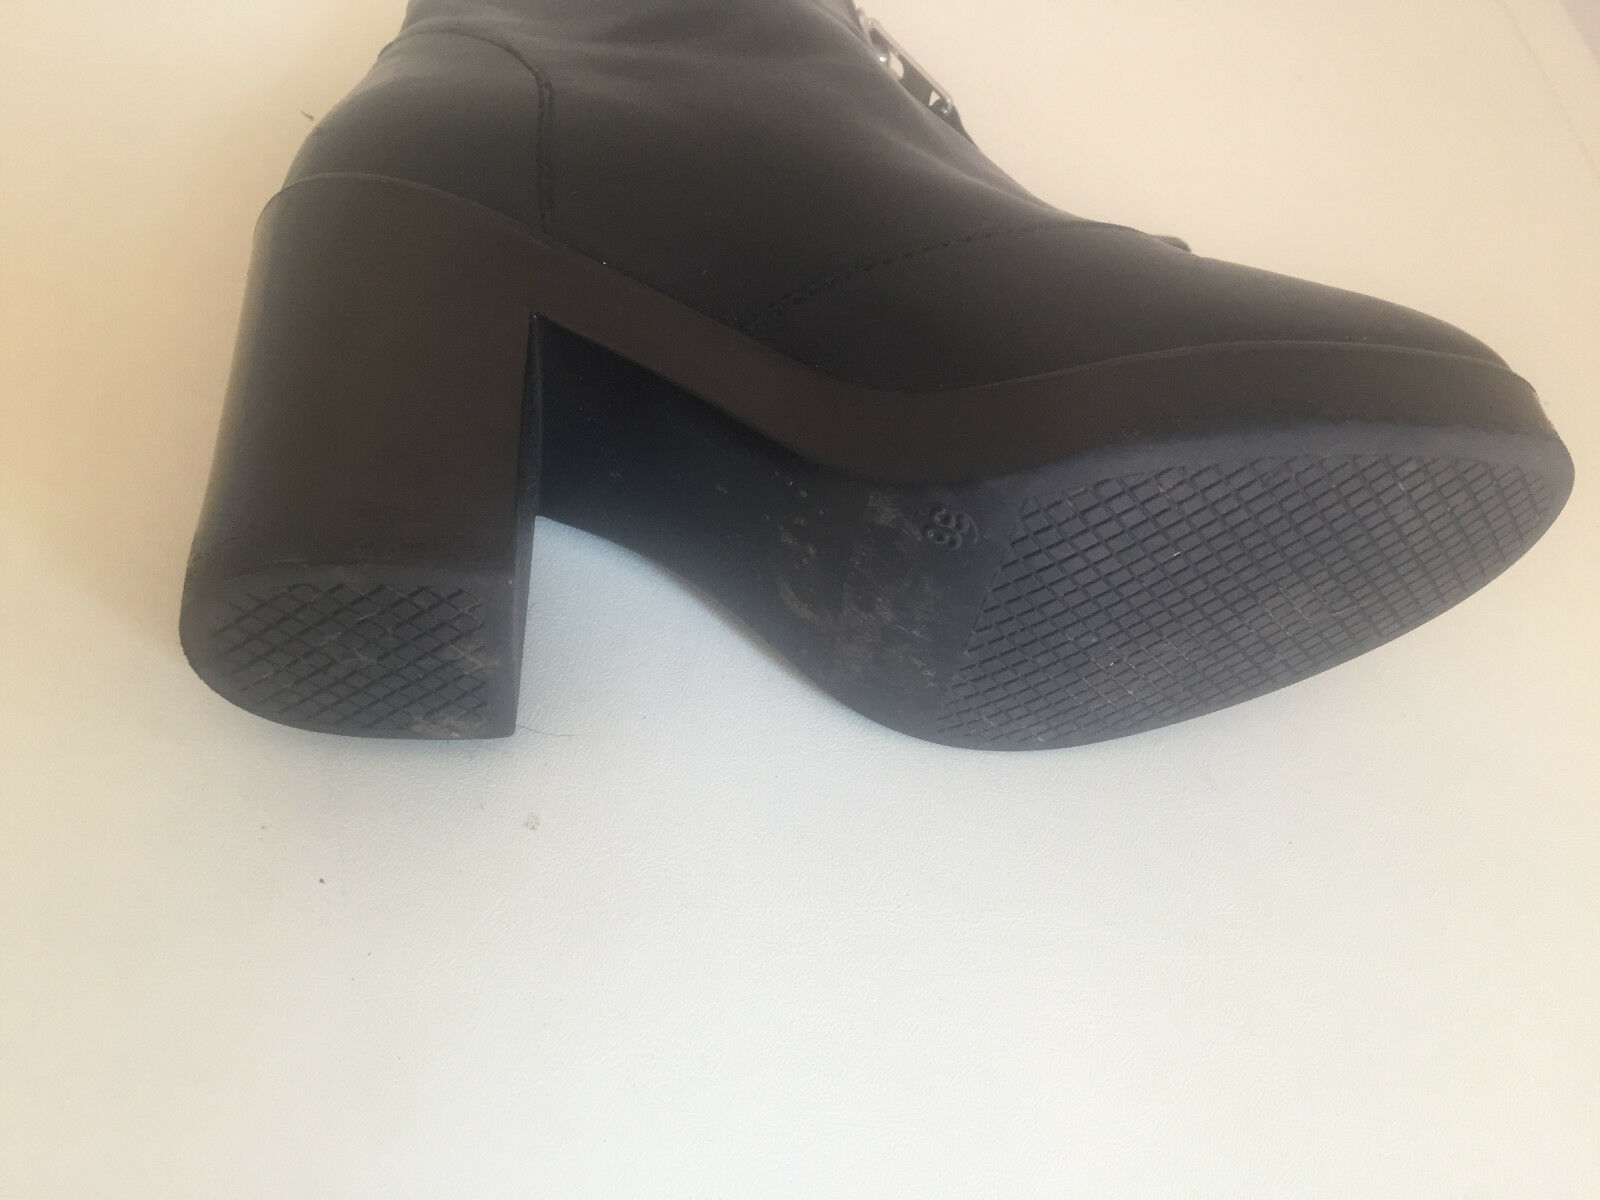 Topshop Negro Cuero Cremallera Bloque Tacón Tacón Bloque Zapatos 36 8be16f